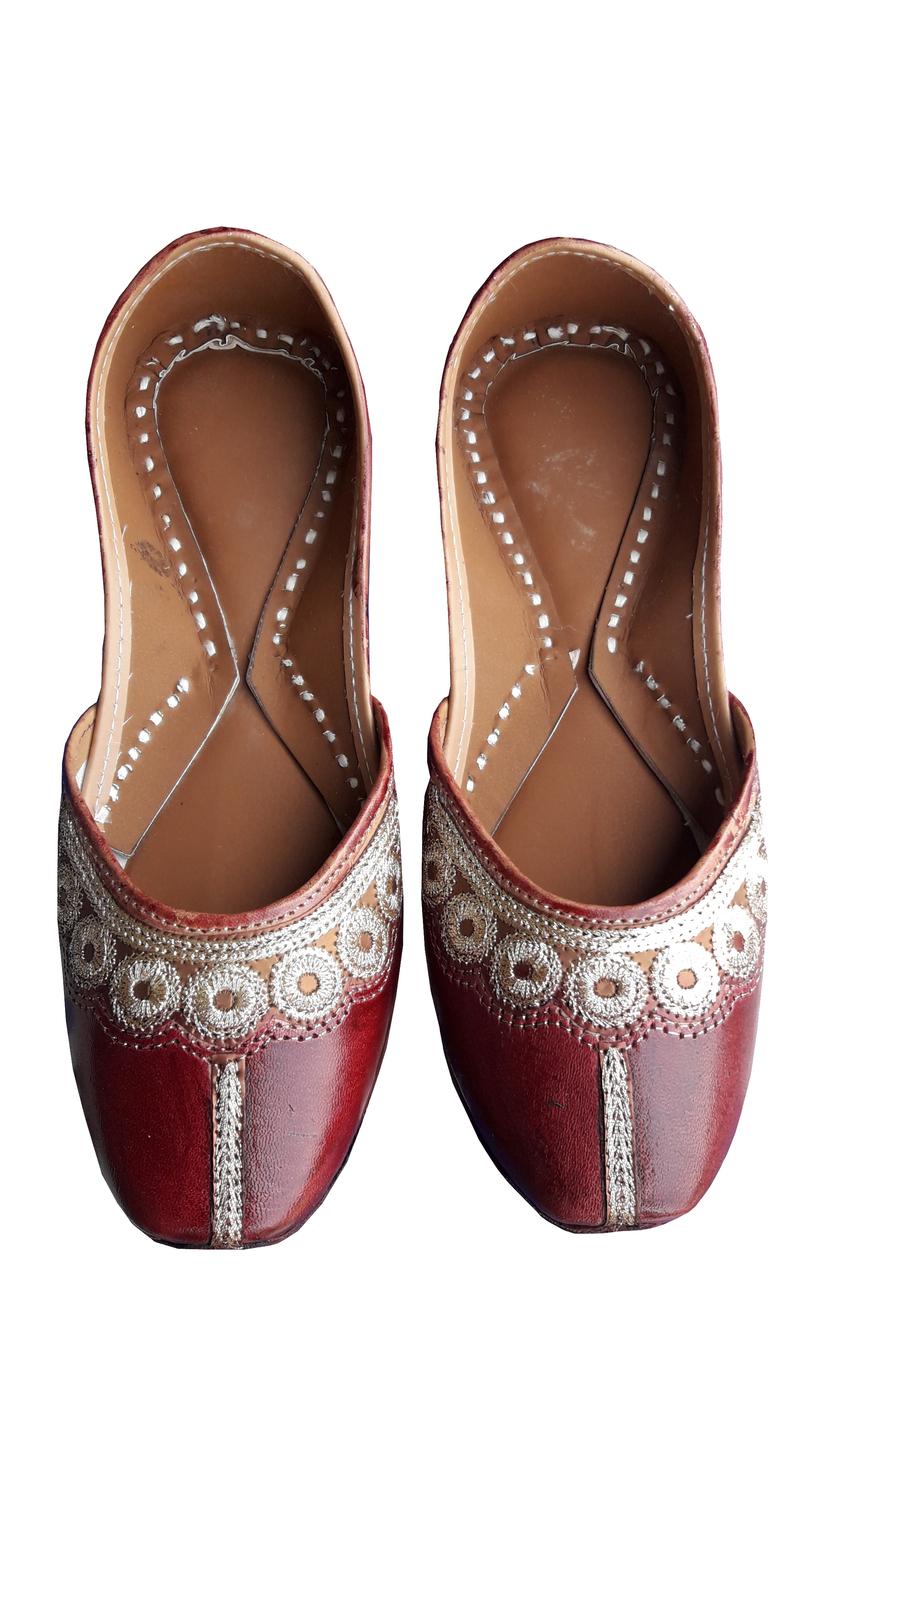 punjabi jutti bridal shoes,indian shoes, traditional shoes USA-9               - $29.99